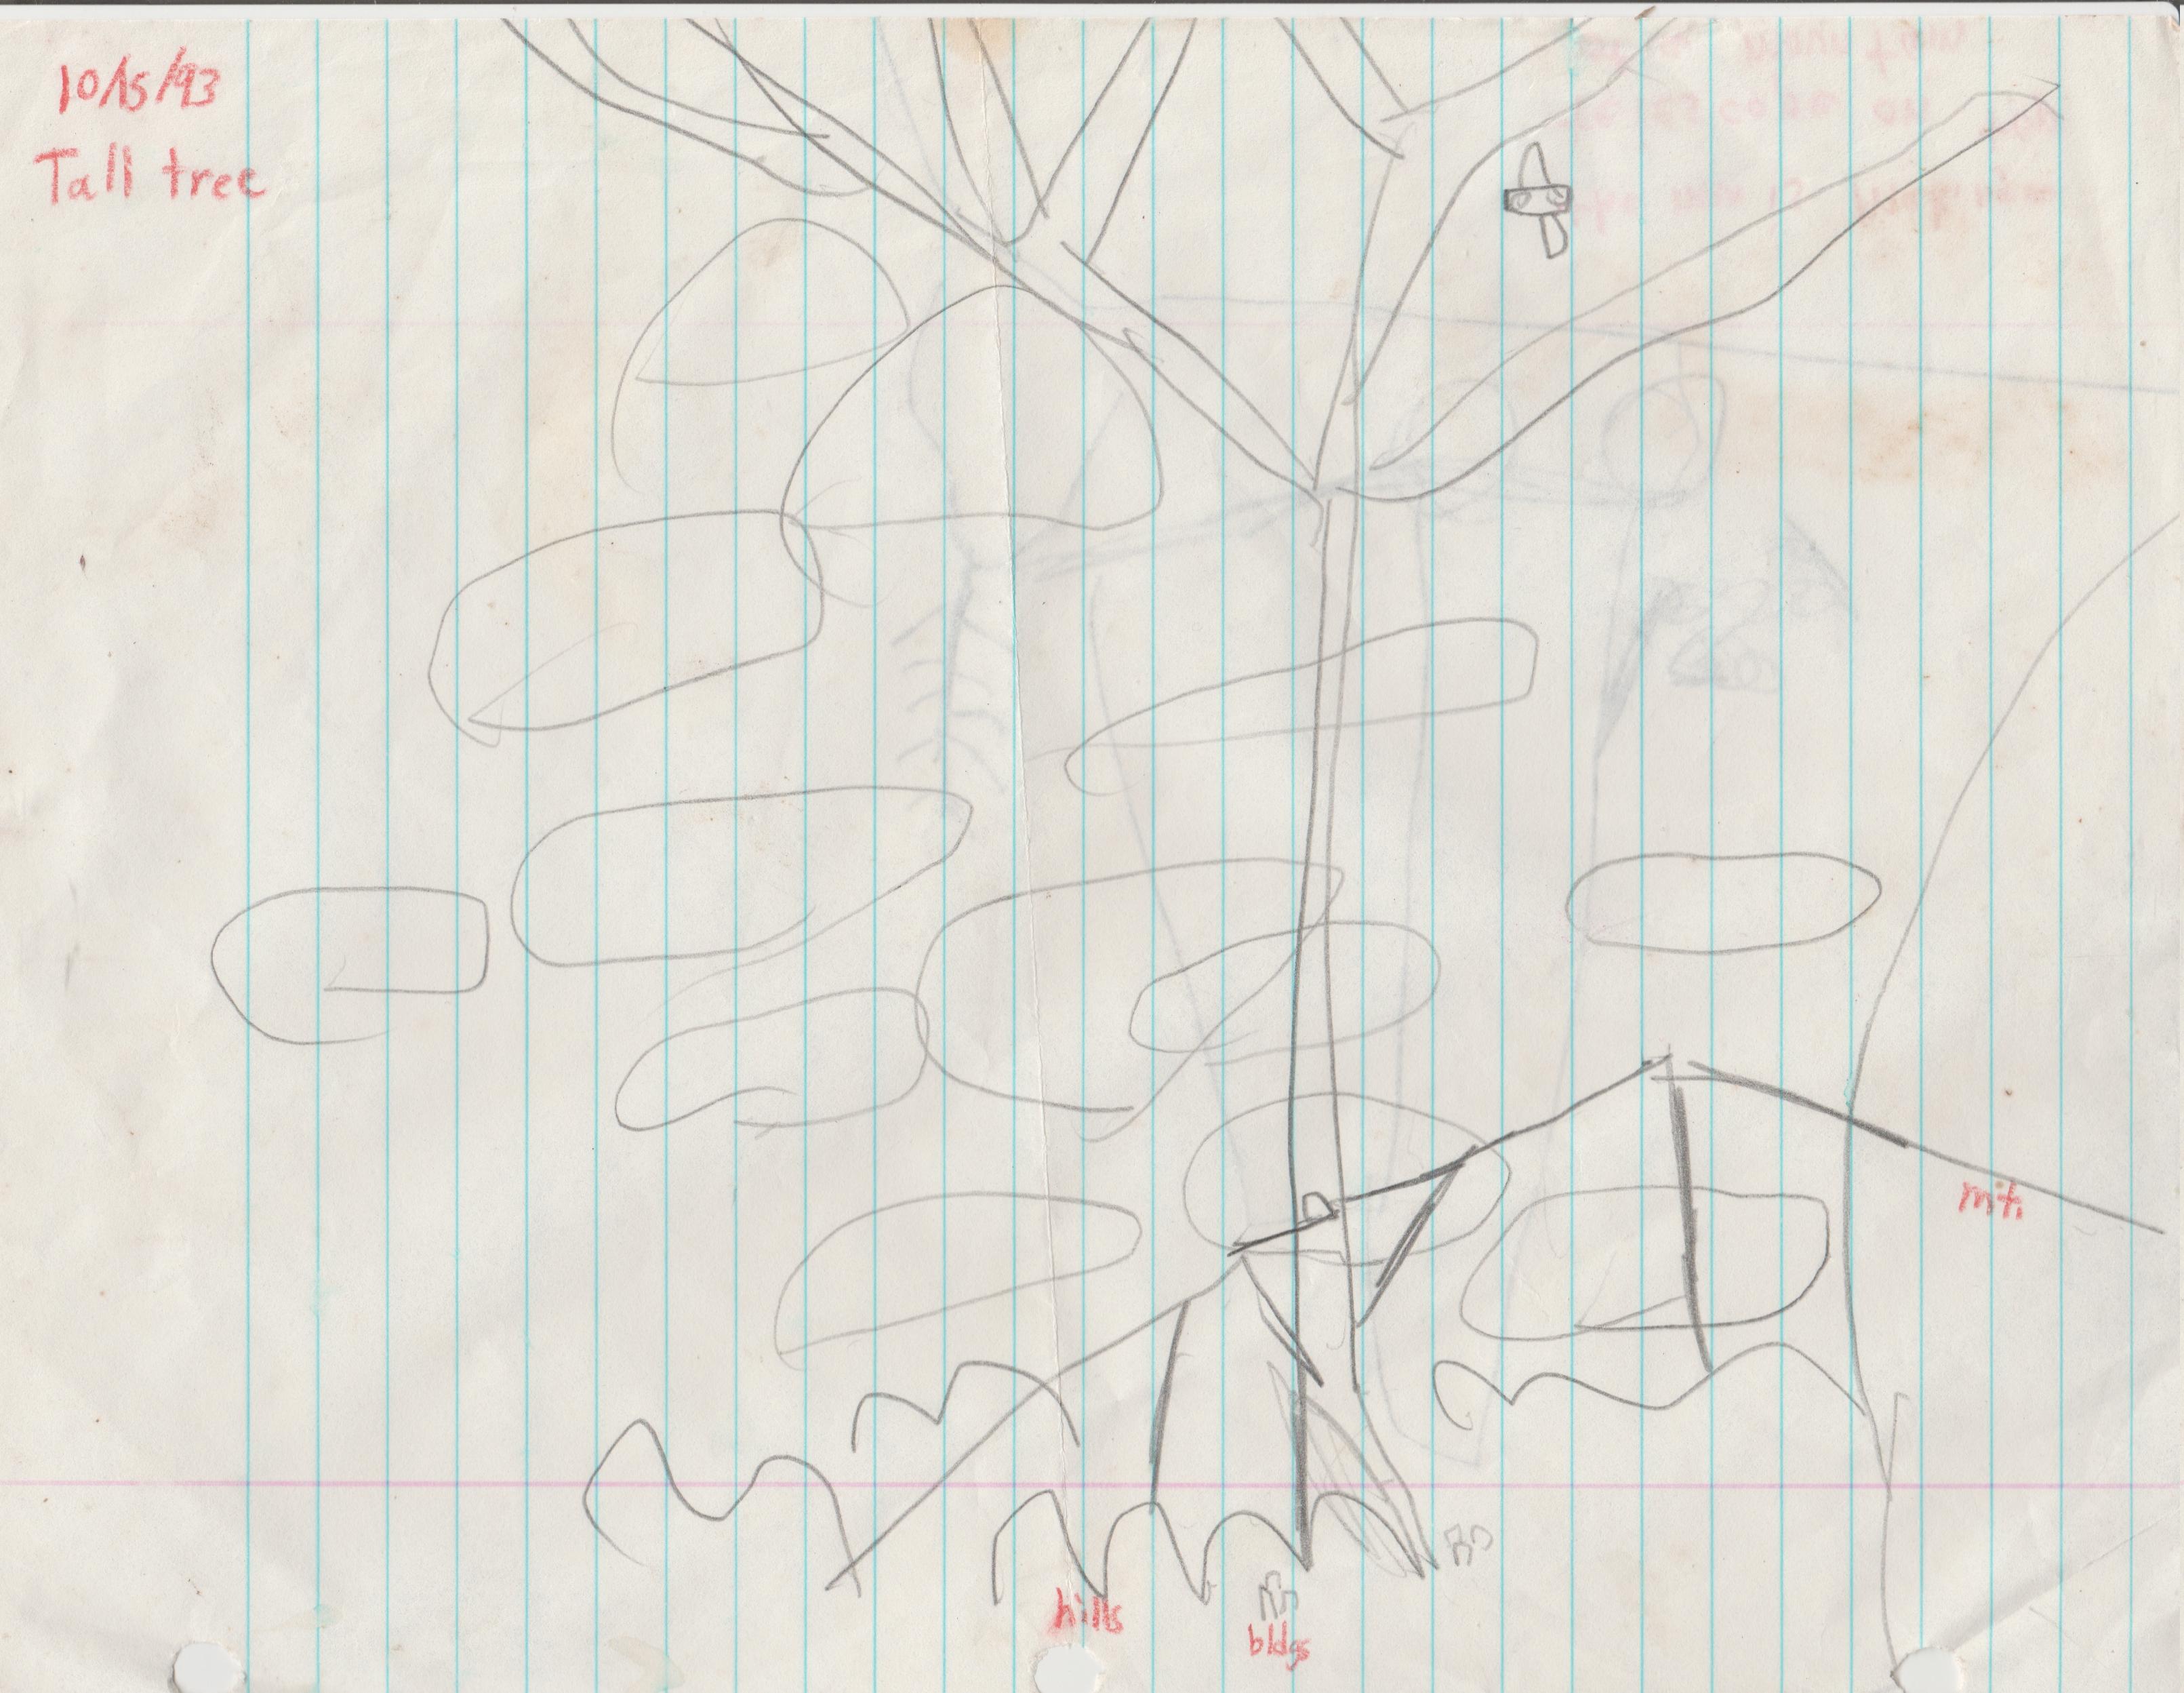 1993-10-15 - Tall Tree, hills, buildings, mountains.jpg